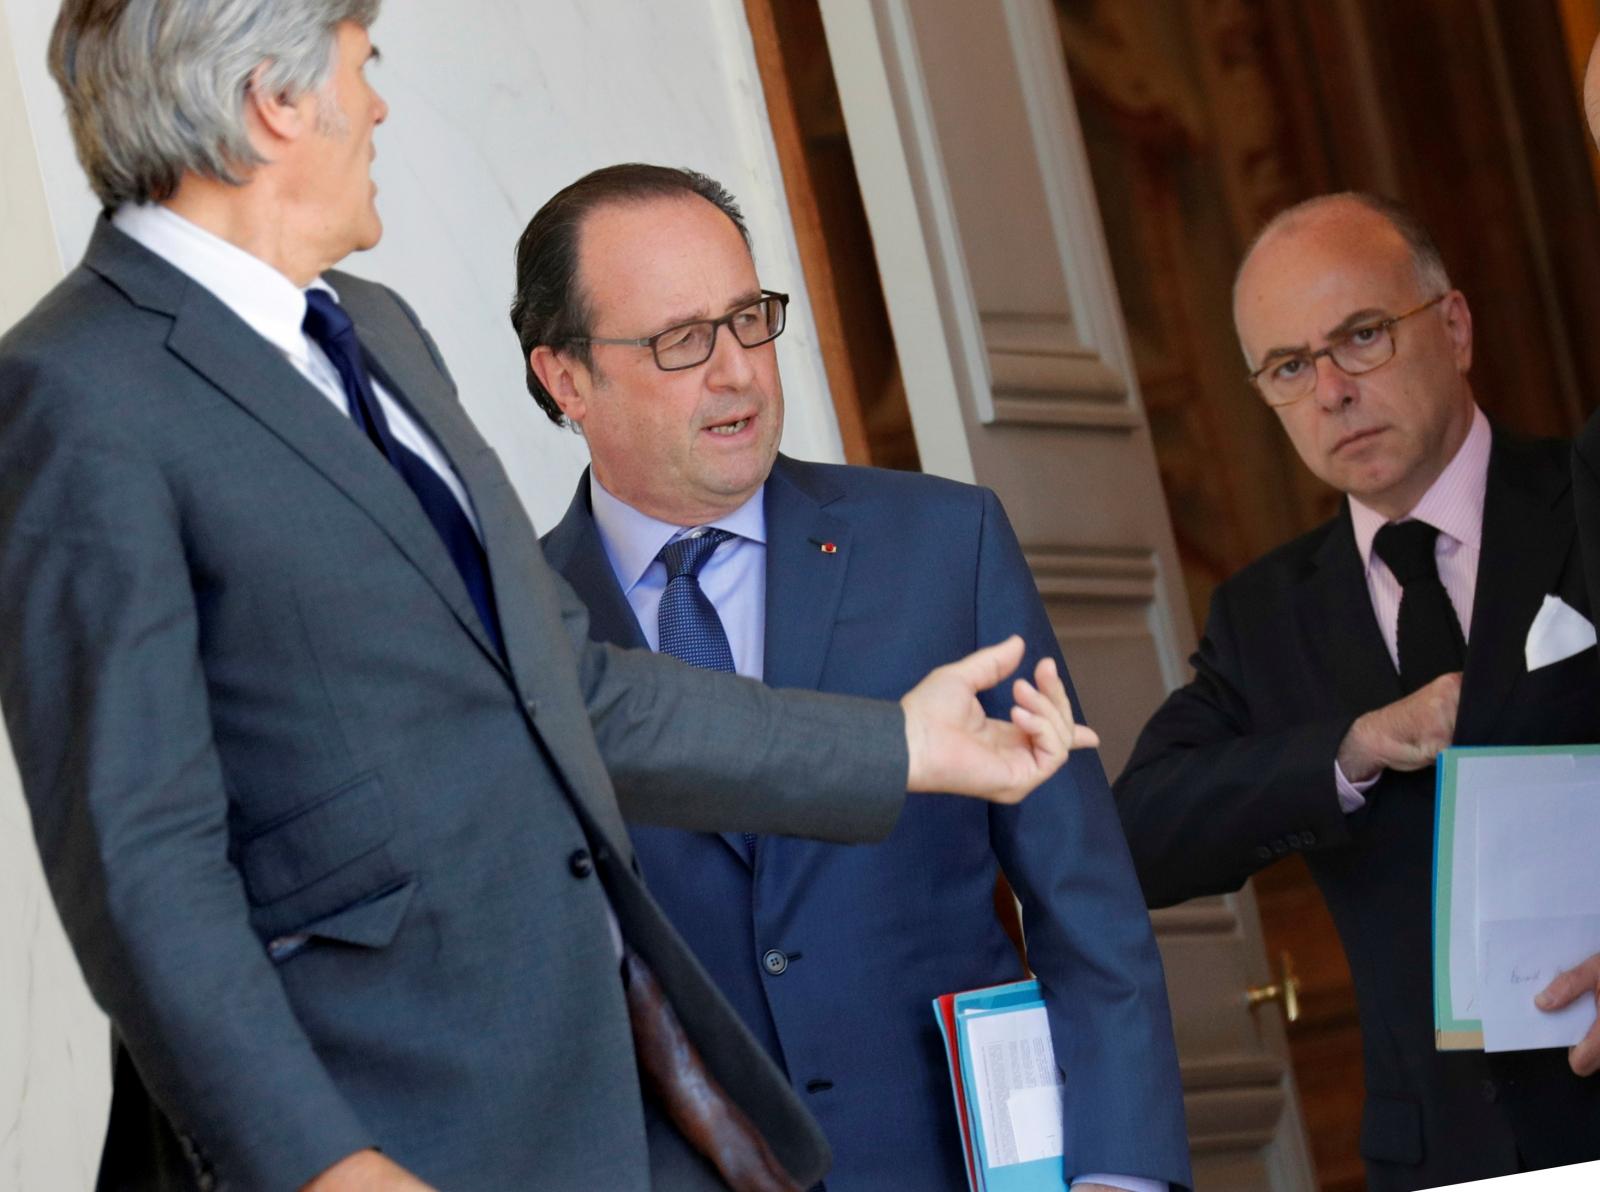 Francois Hollande & Bernard Cazeneuve